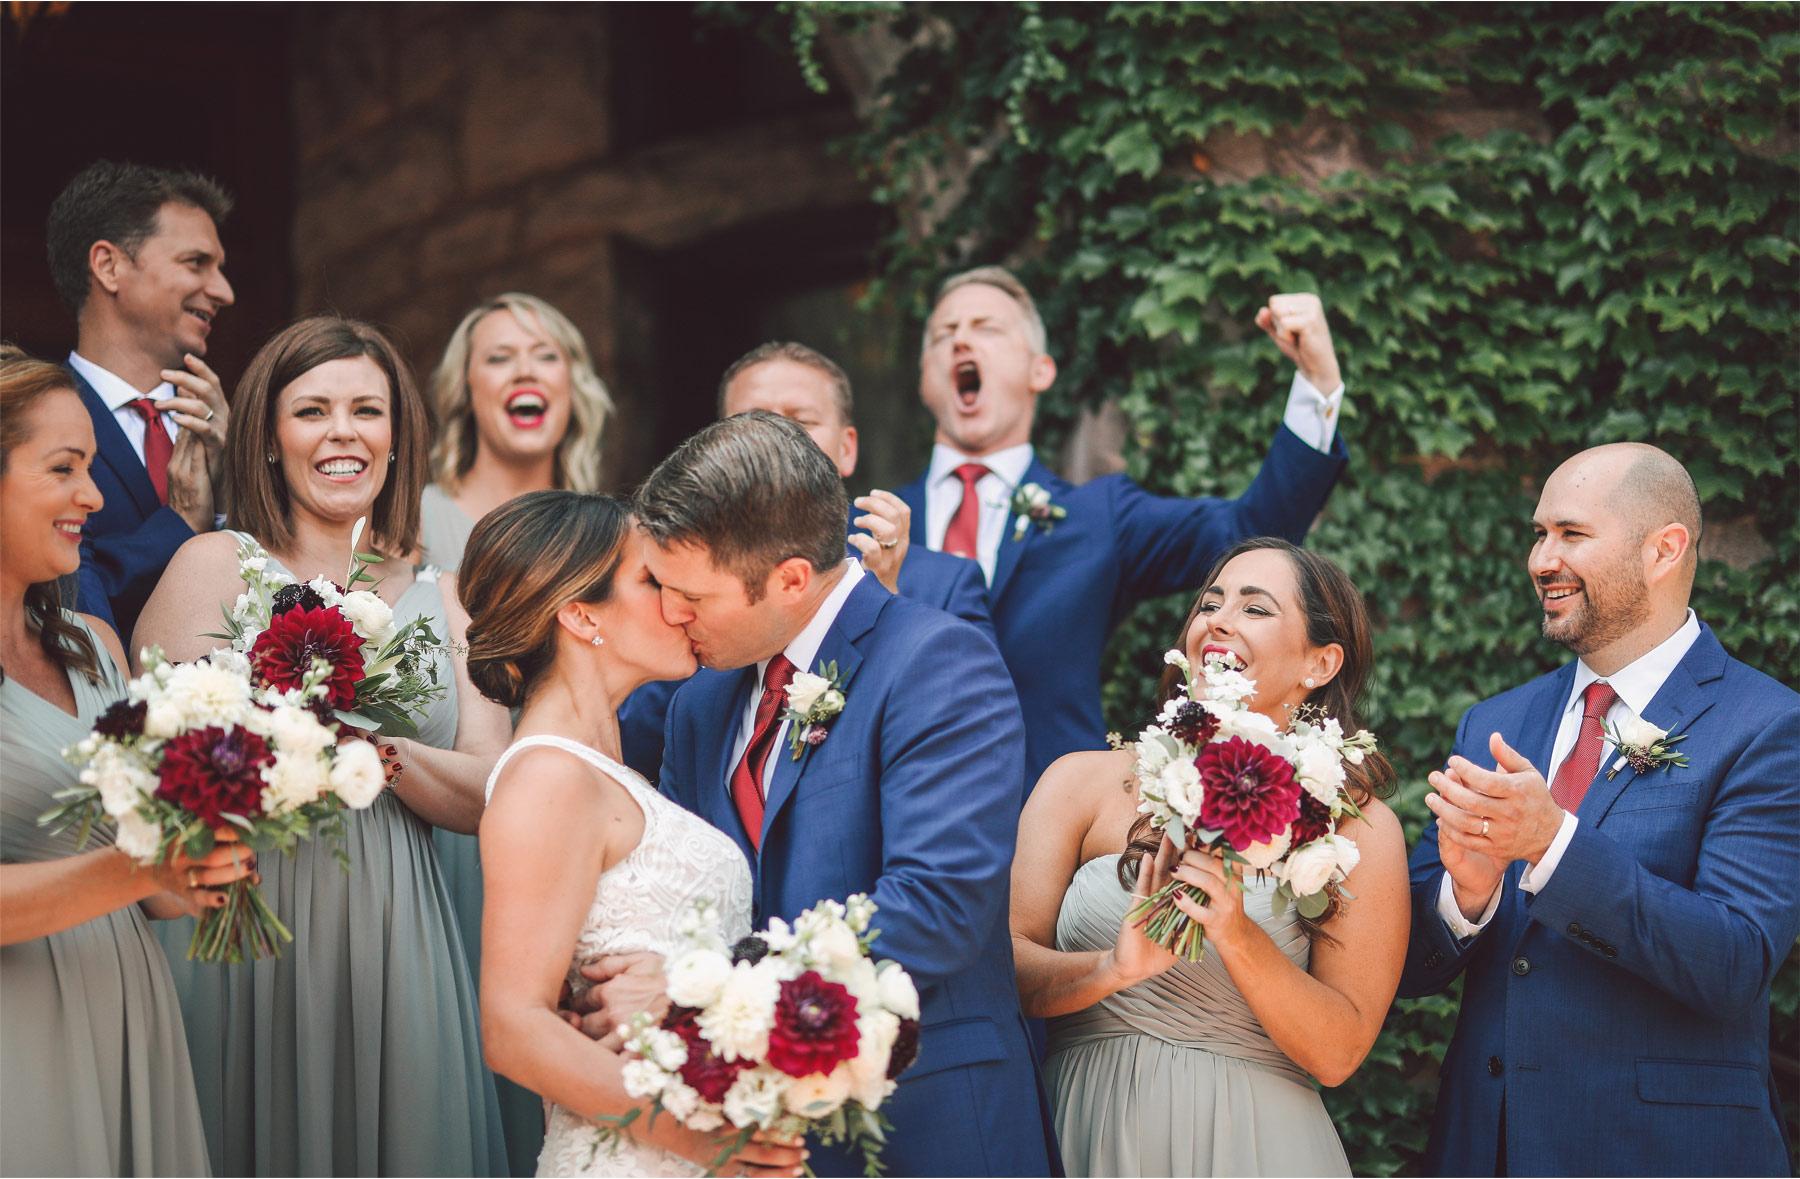 09-Minneapolis-Minnesota-Wedding-Photographer-by-Vick-Photography-Van-Dusen-Mansion-Wedding-Party-Group-Megan-and-Ned.jpg